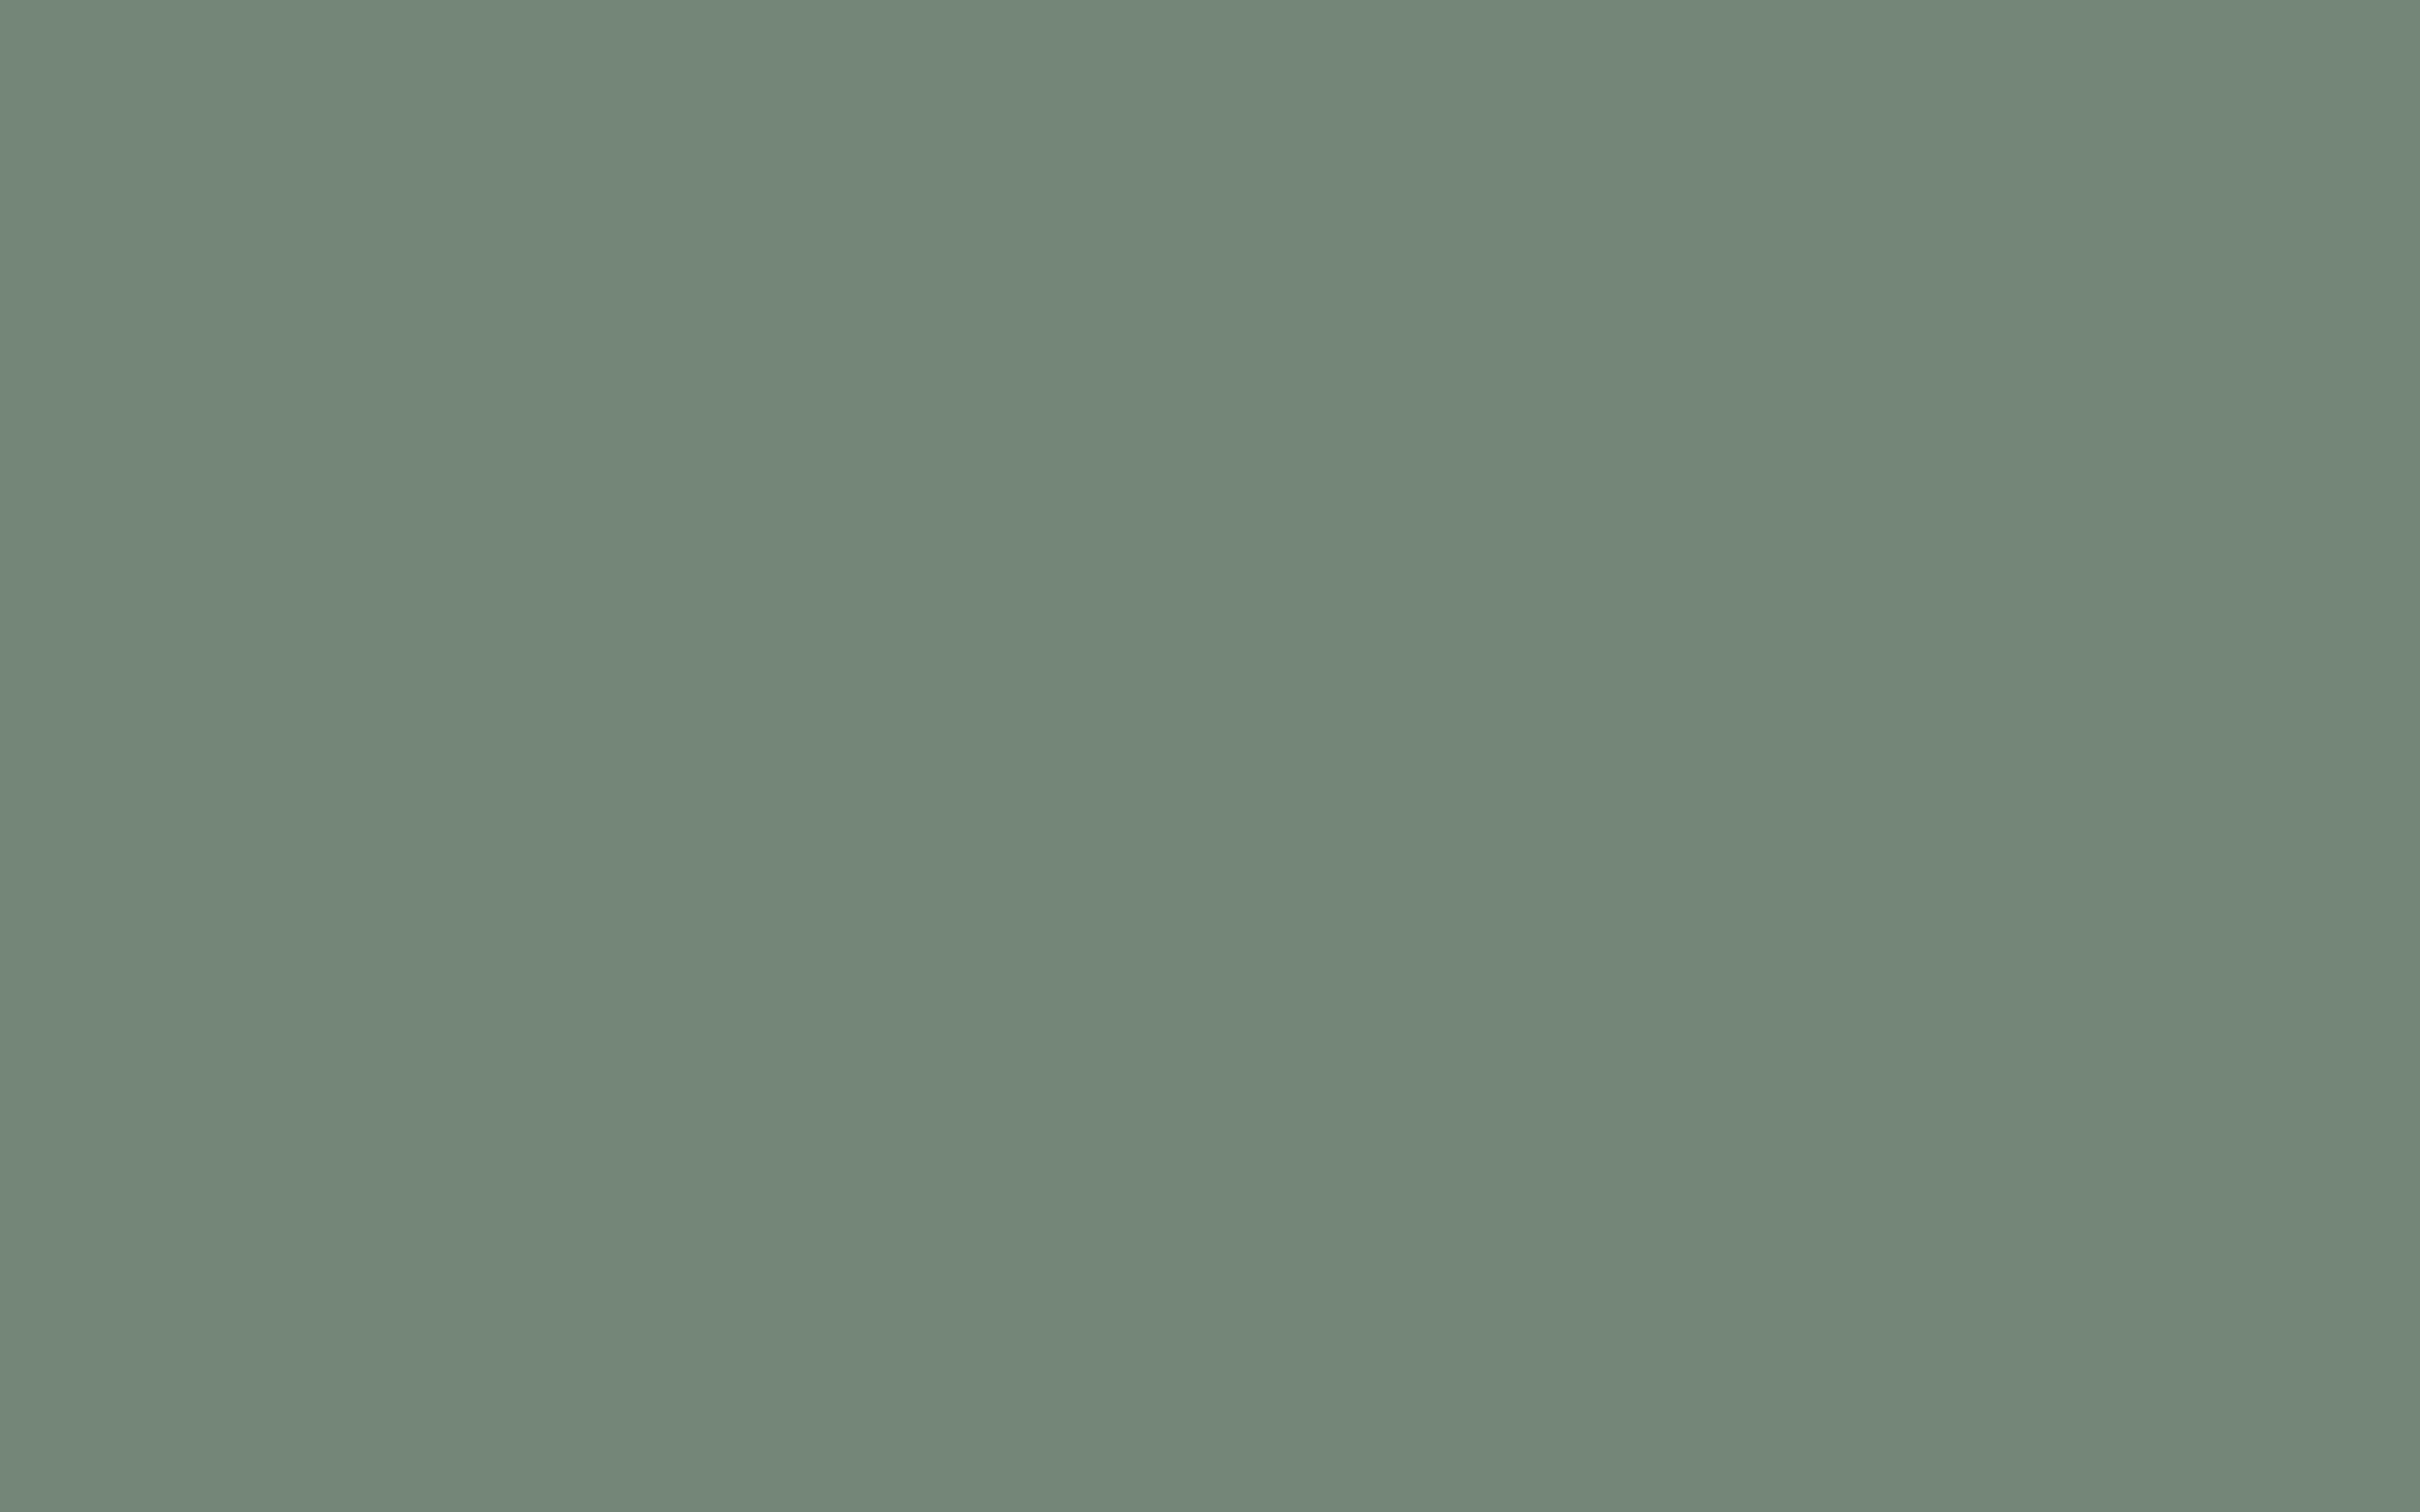 2560x1600 Xanadu Solid Color Background